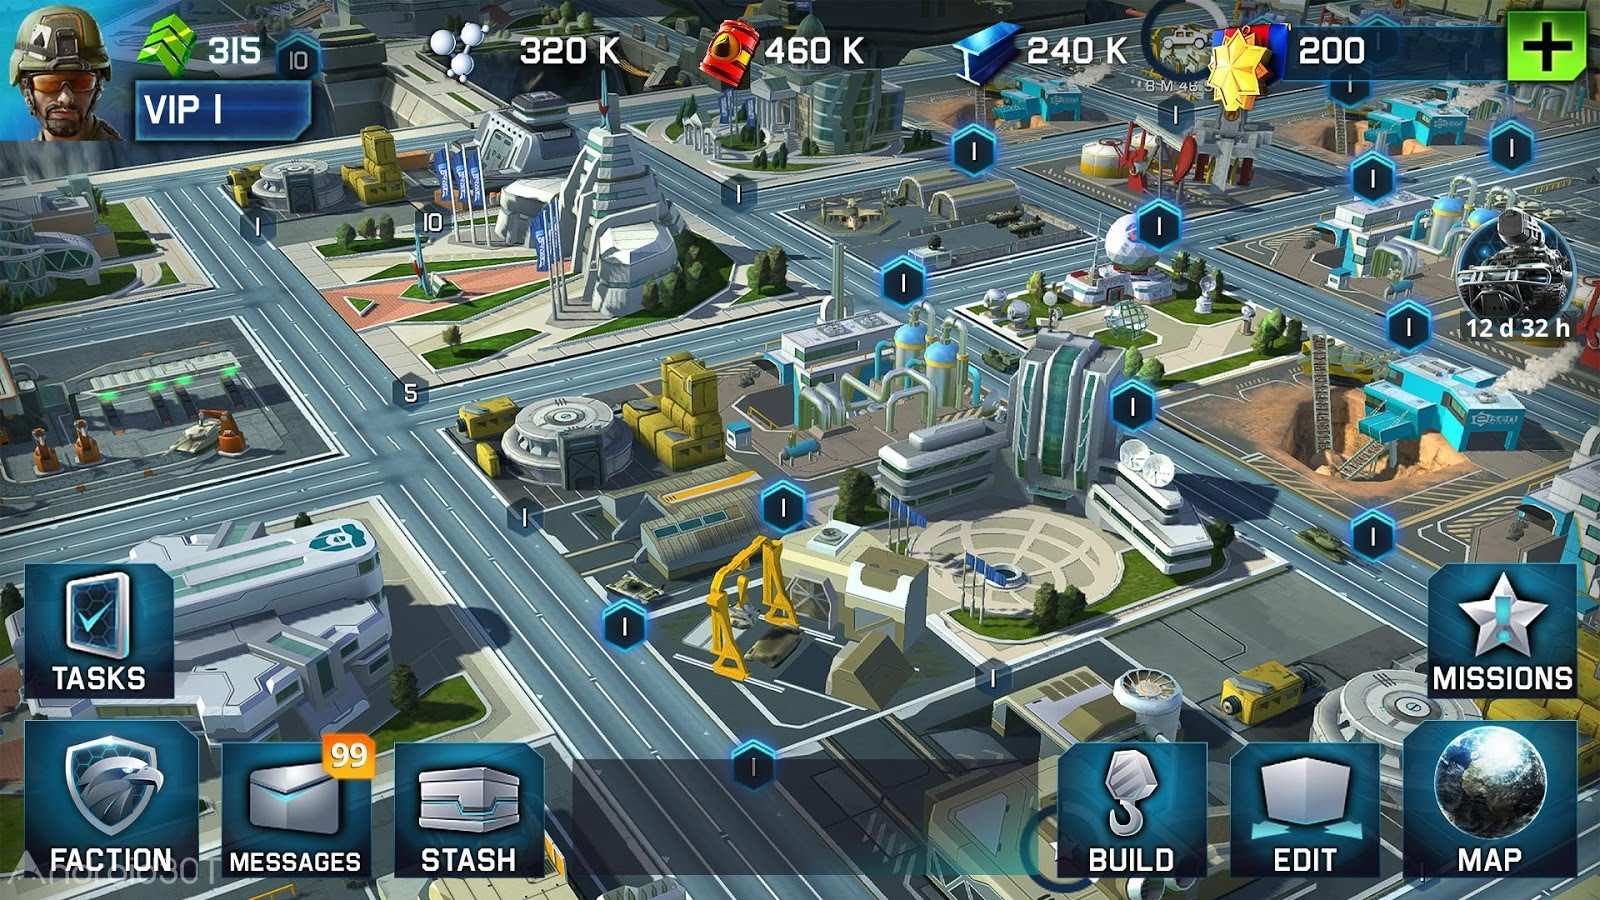 دانلود War Planet Online: Global Conquest 3.9.1 – بازی جنگ سیاره اندروید